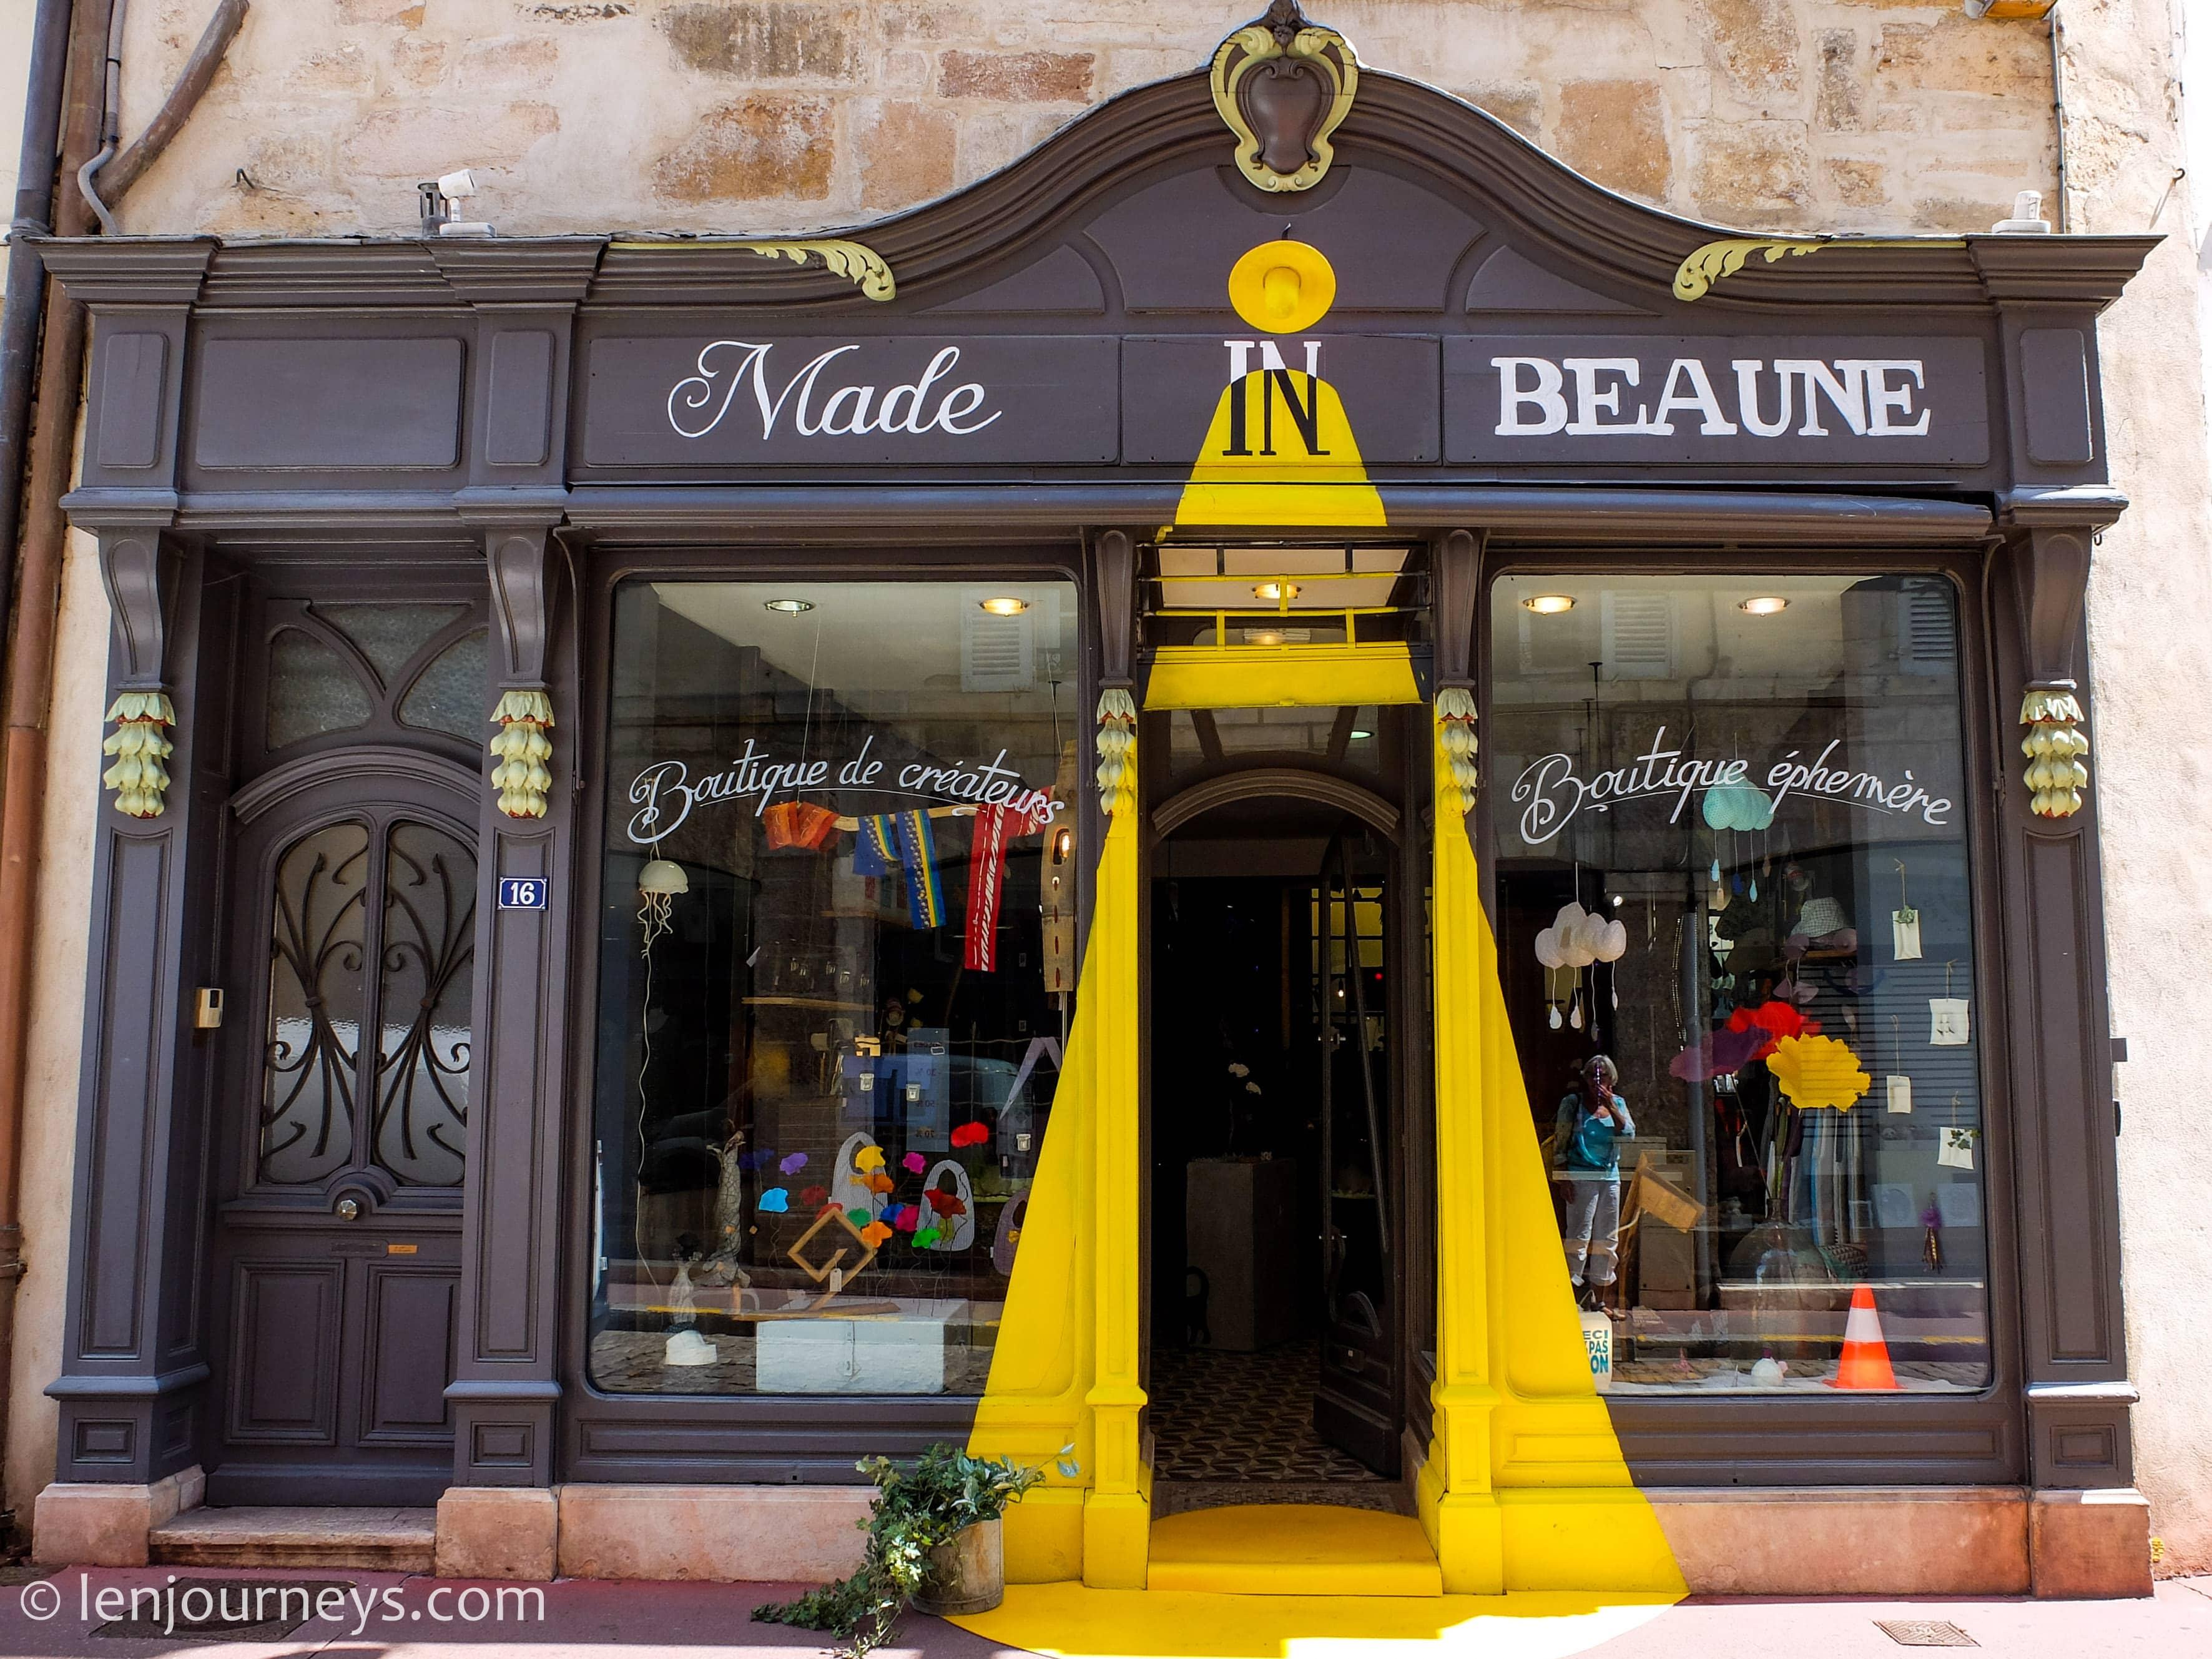 Shop in Beaune, Burgundy